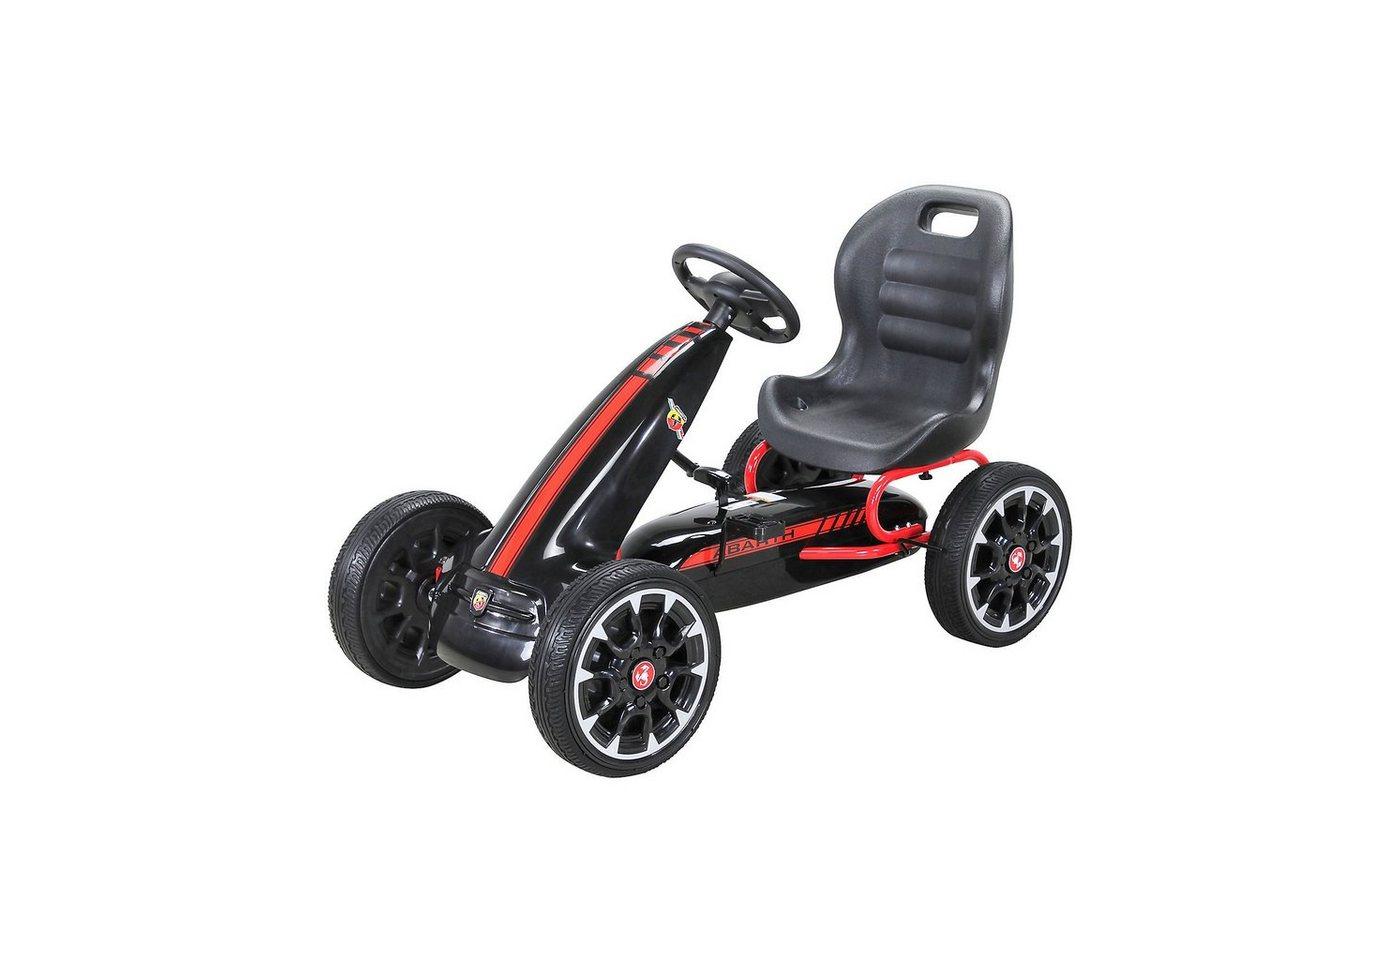 Actionbikes Motors Kinder Pedal Go Kart Abarth FS595, schwarz